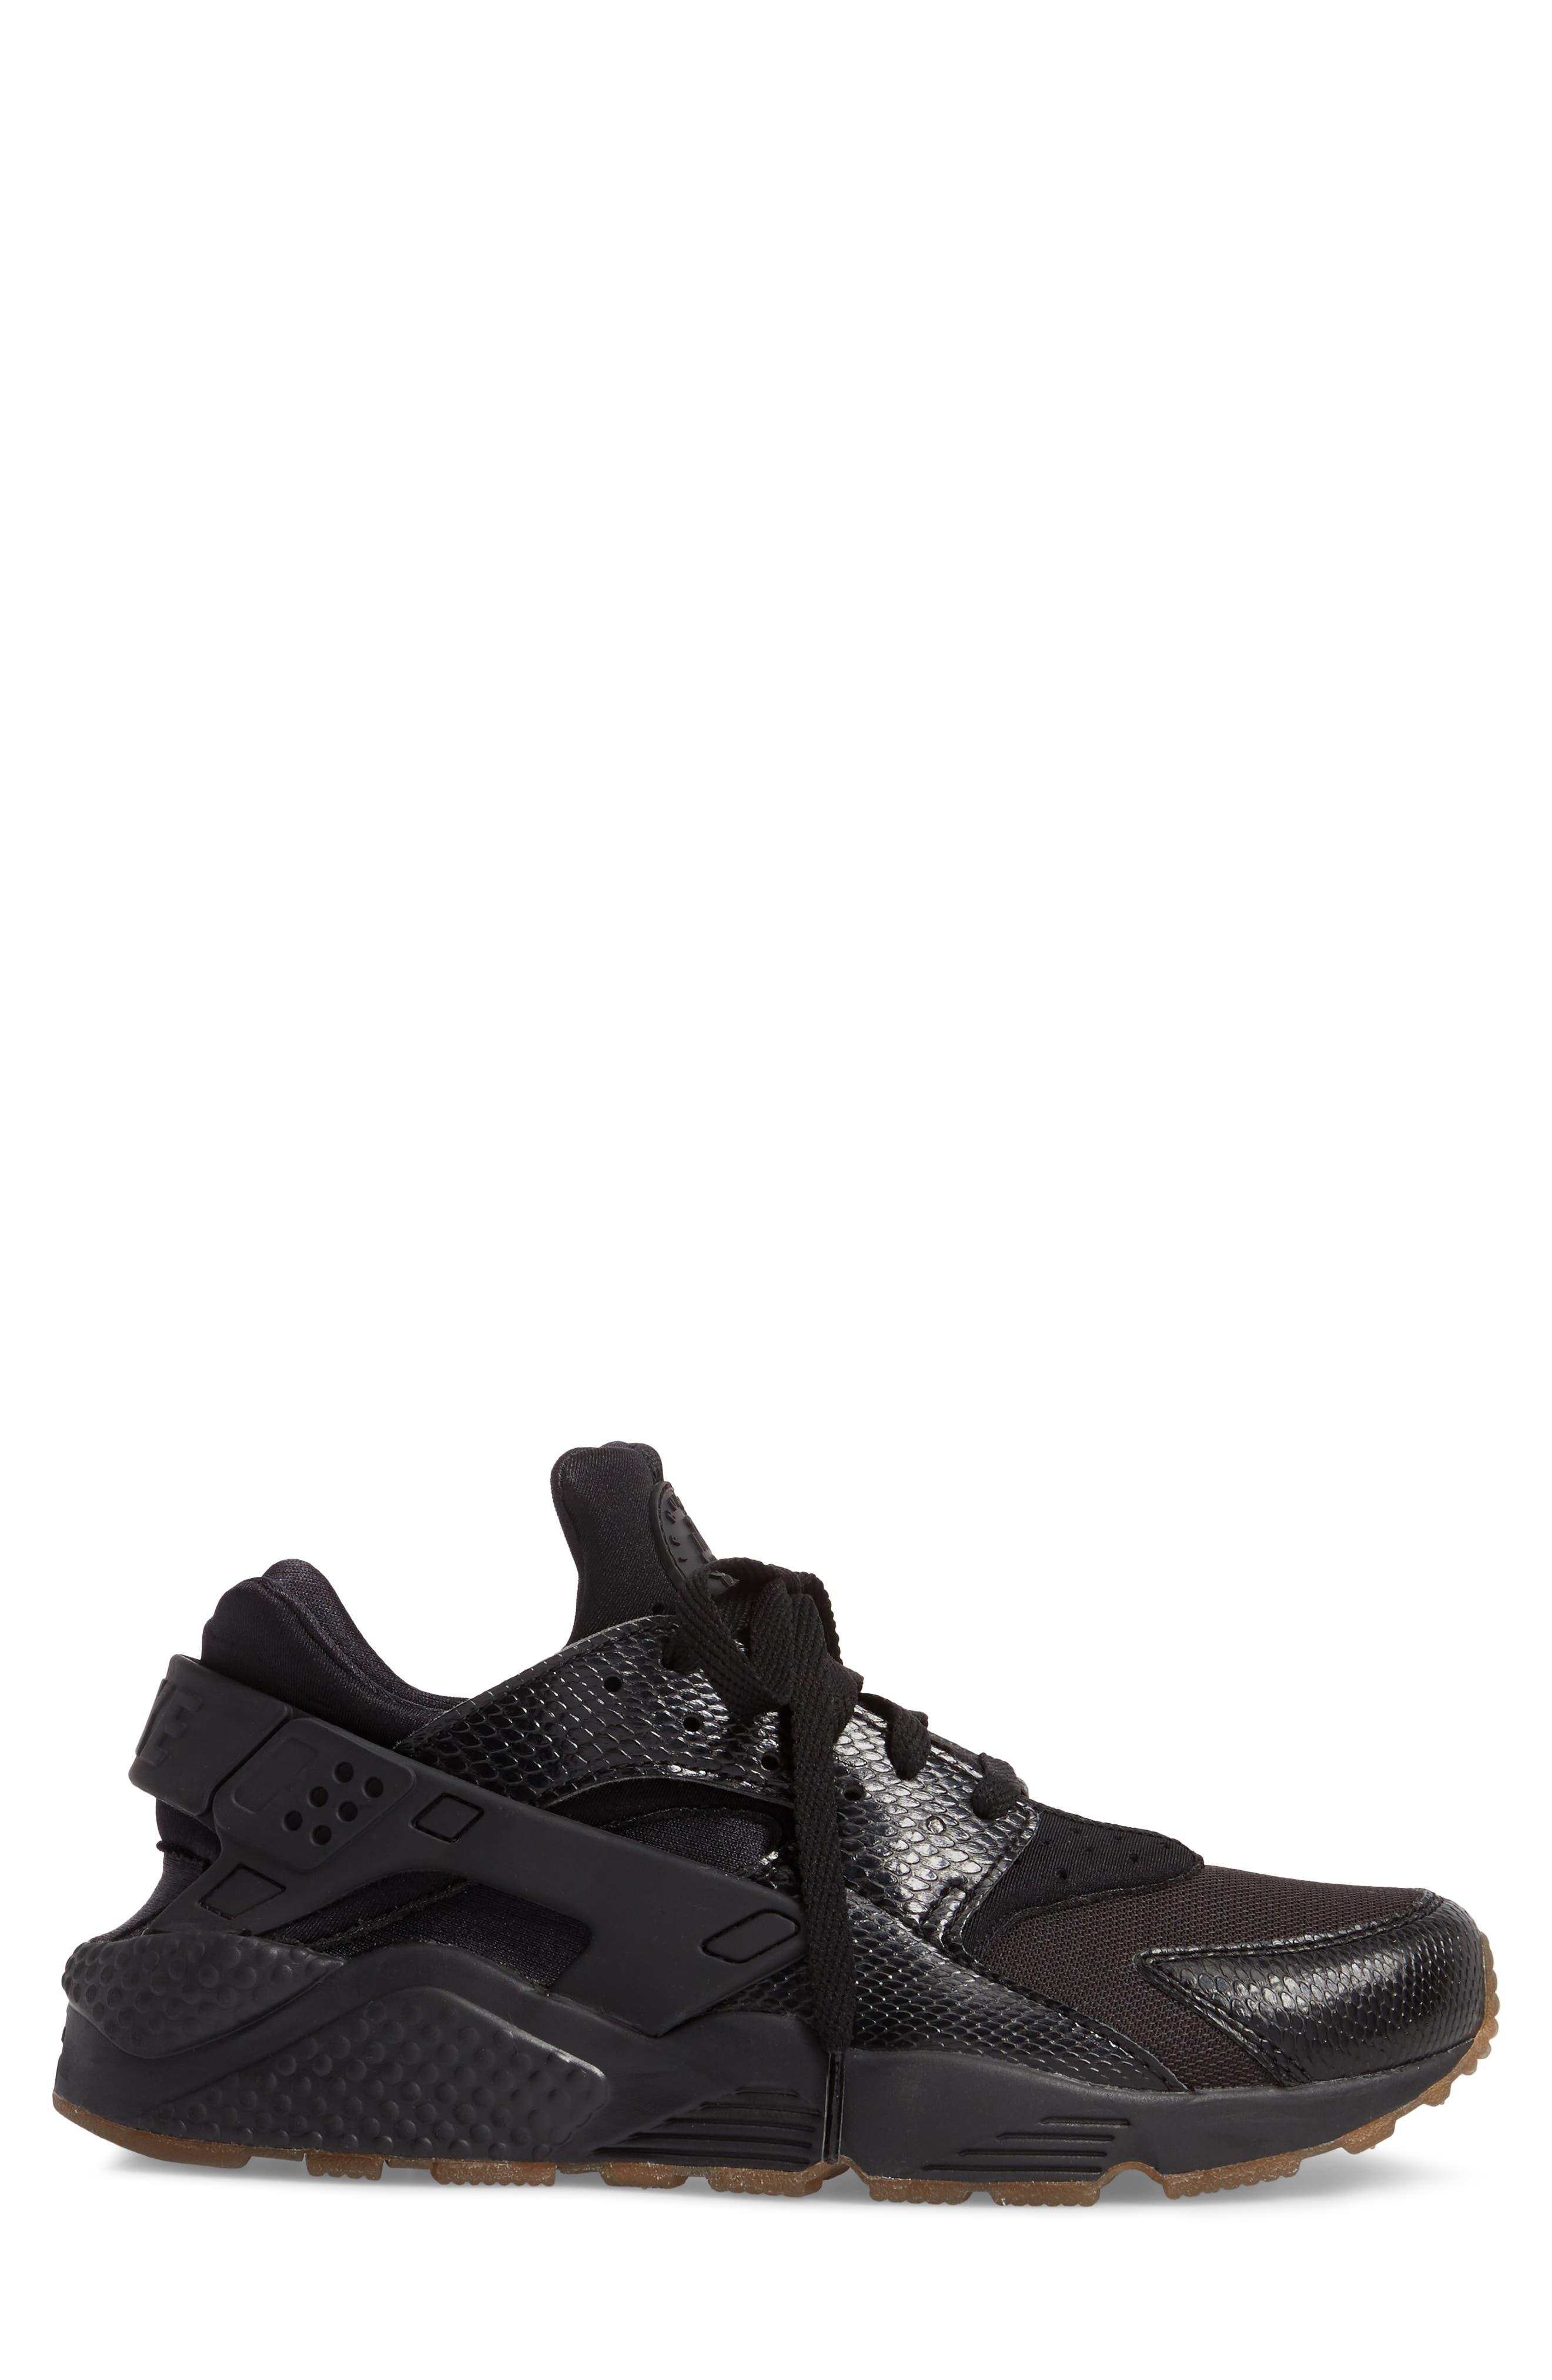 'Air Huarache' Sneaker,                             Alternate thumbnail 3, color,                             Black/ Elemental Gold/ Brown